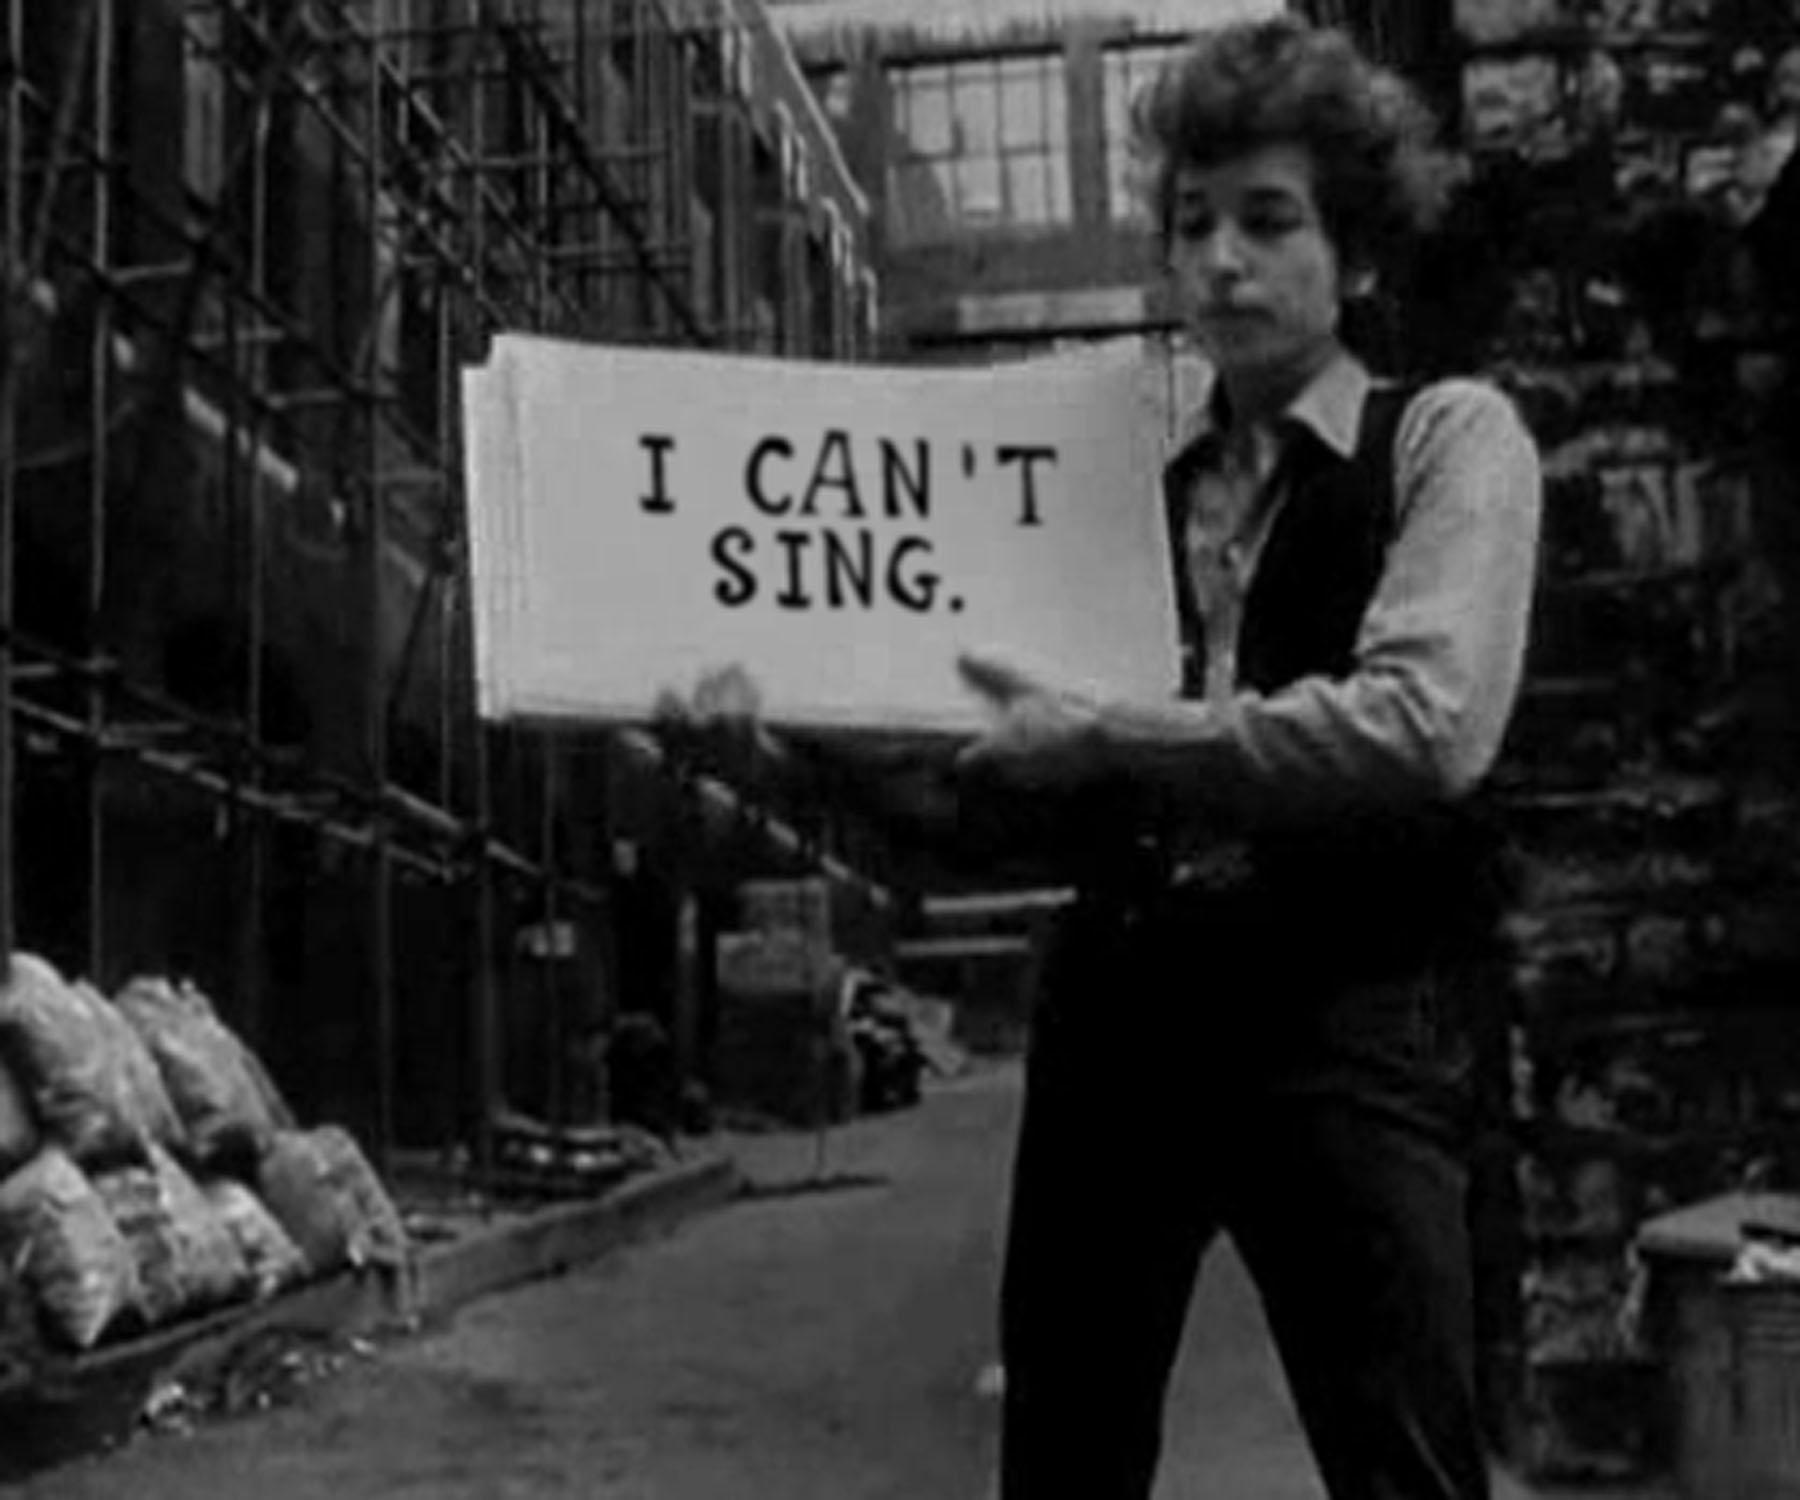 Bob Dylan a Cortona? Sto bene anche senza